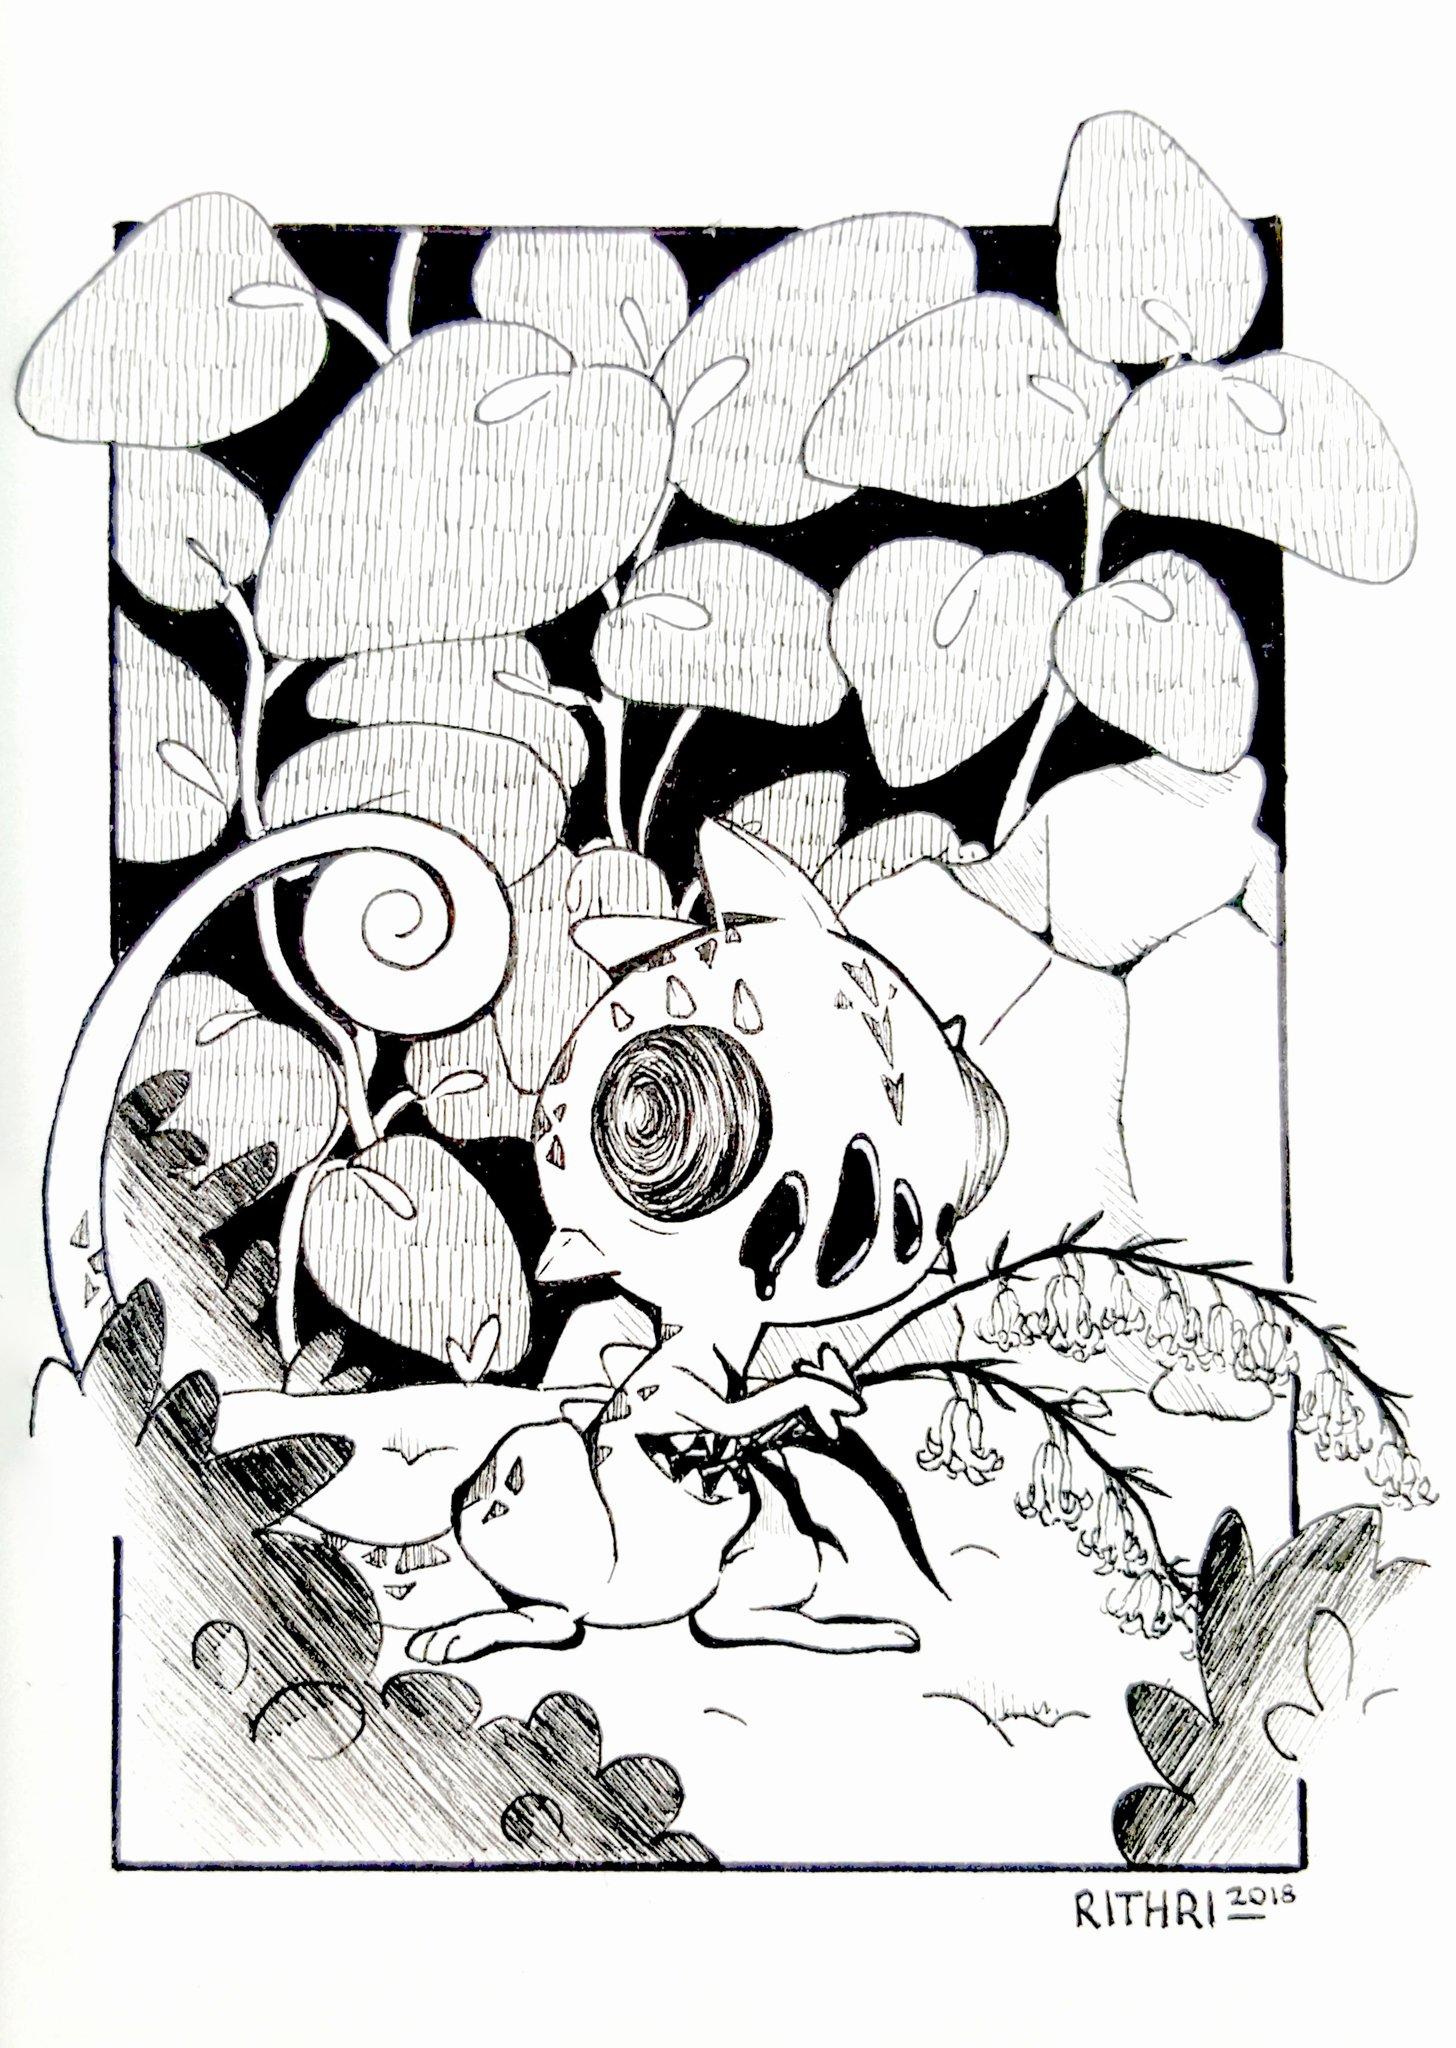 Hors thème – Rithri, Inktober 2018